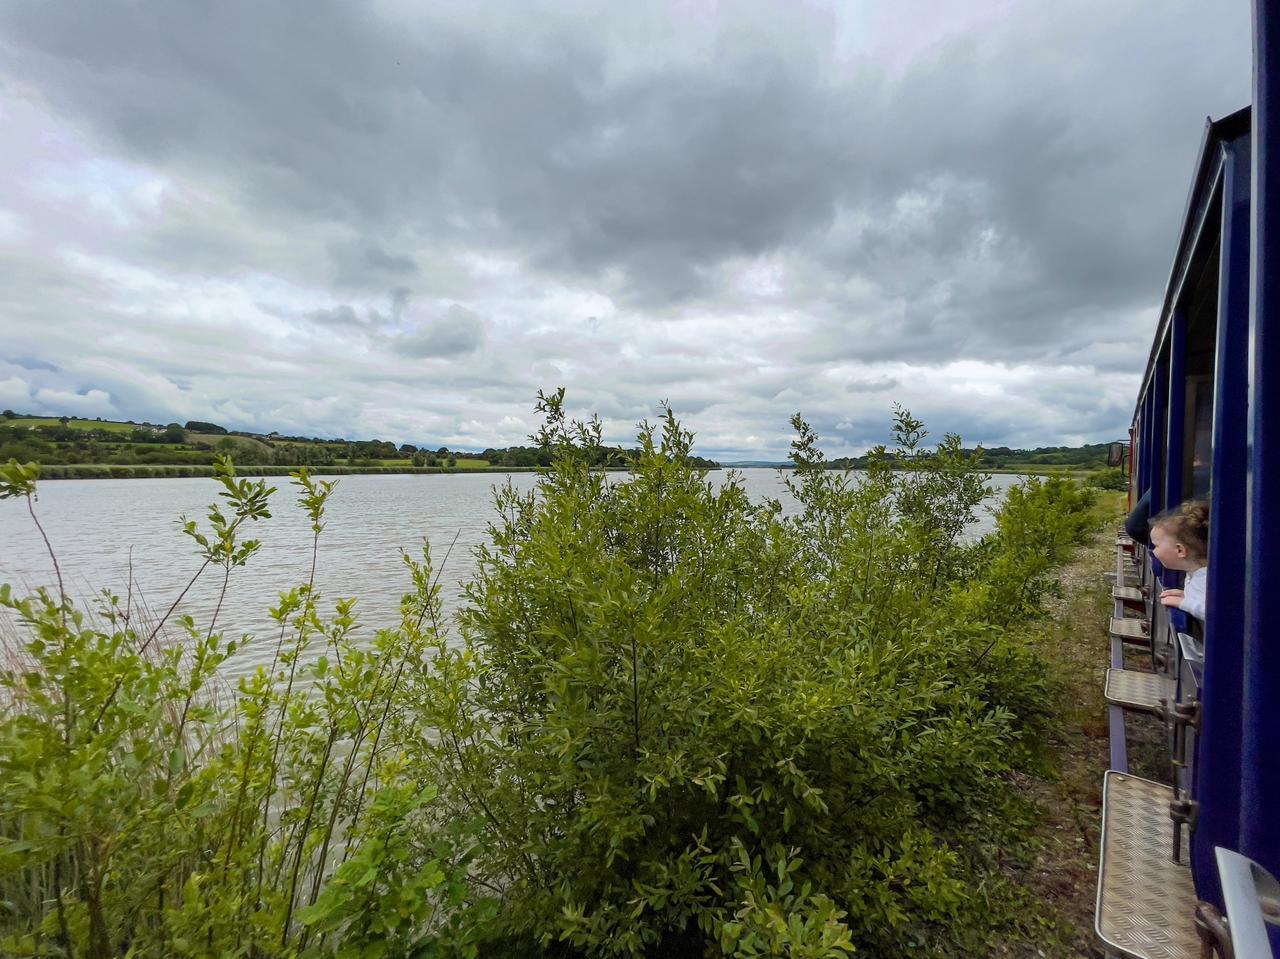 Cloud, Water, Sky, Plant, Ecoregion, Lake, Wood, Grass